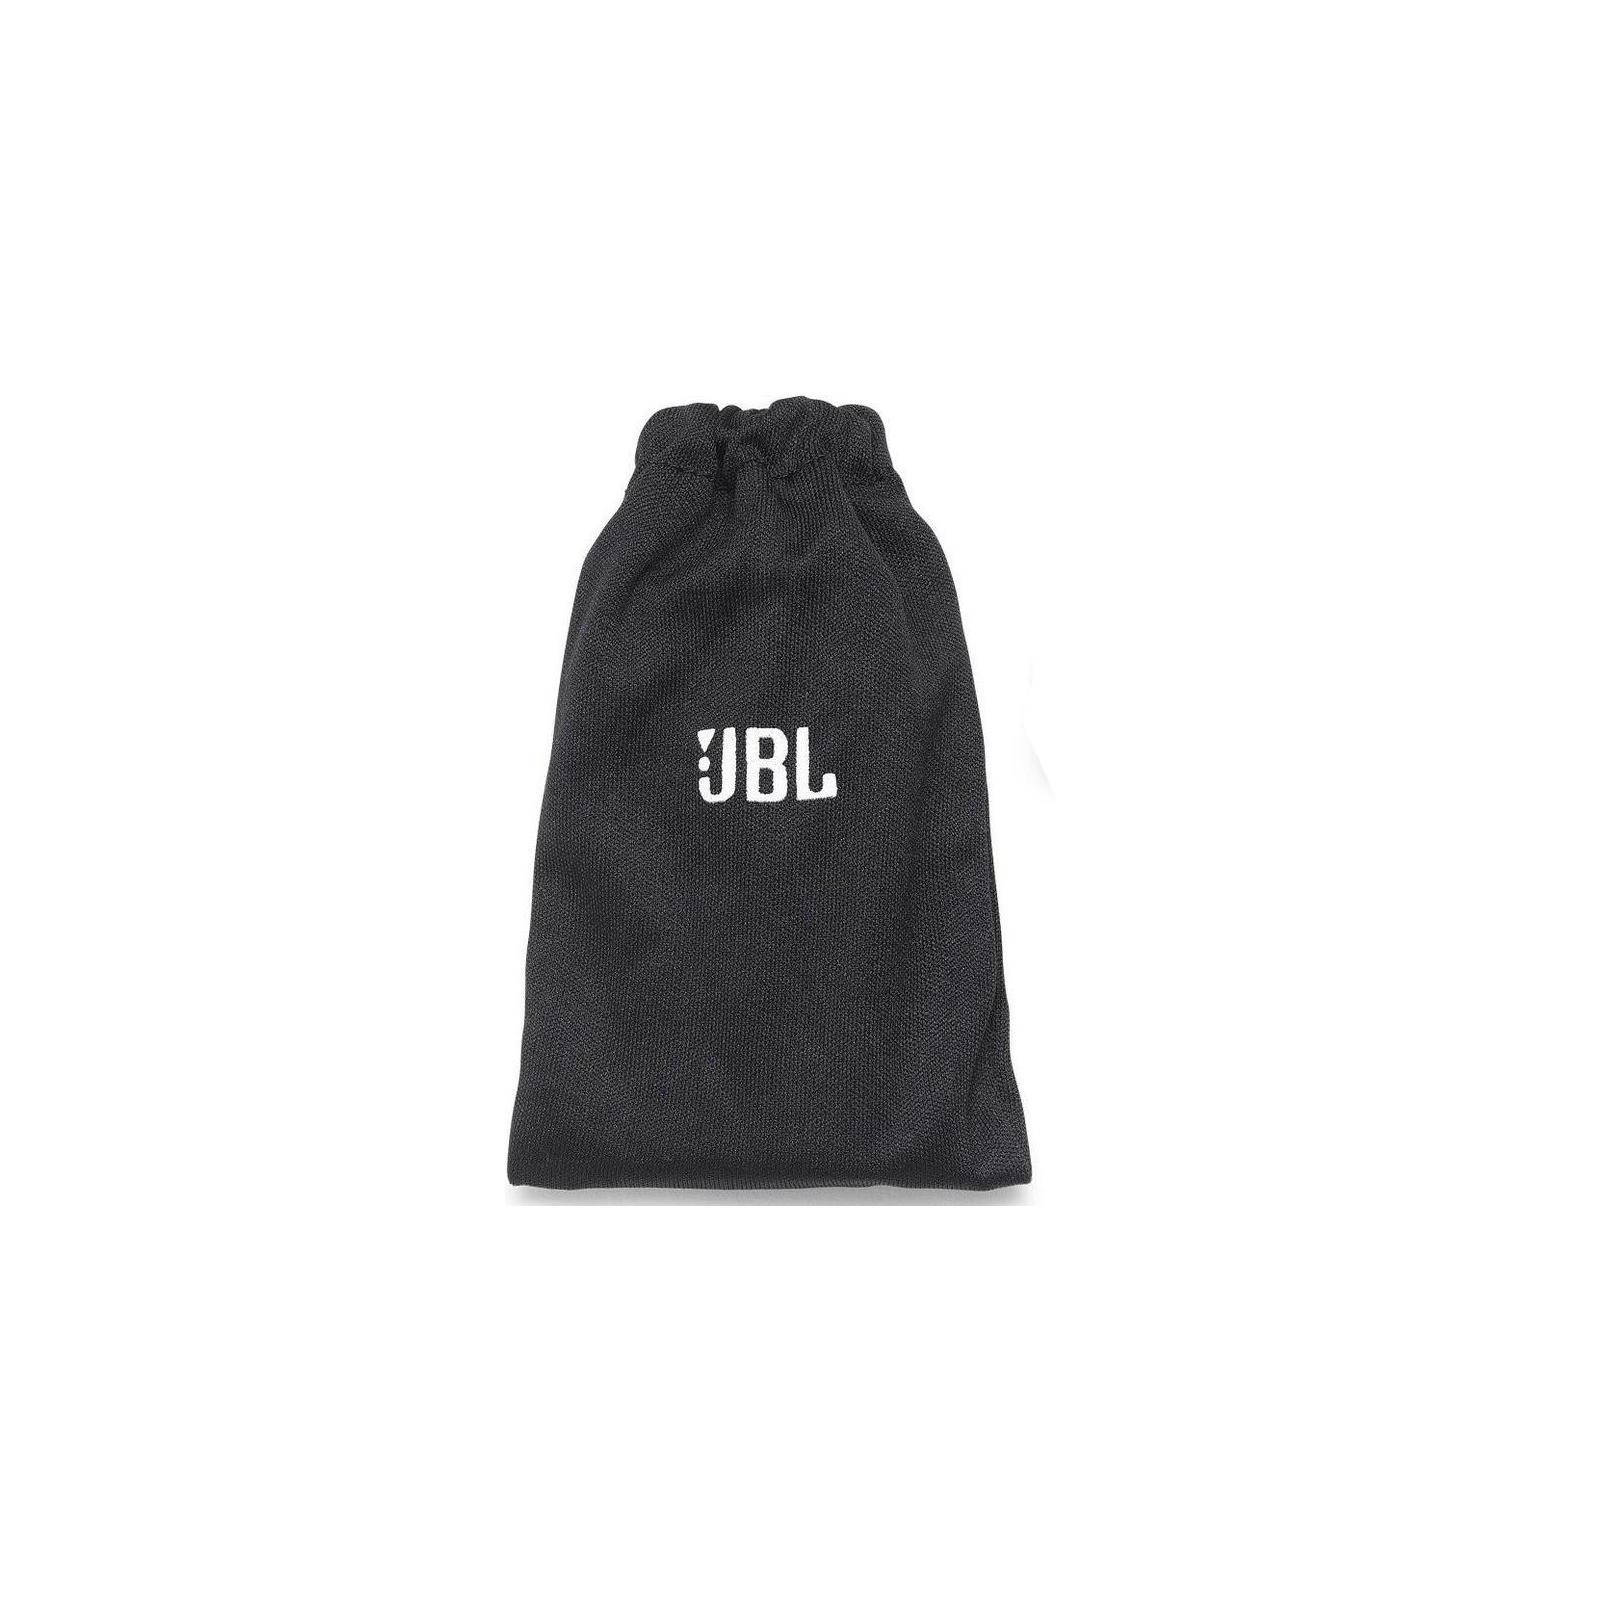 Наушники JBL T205 Black (T205BLK) изображение 5